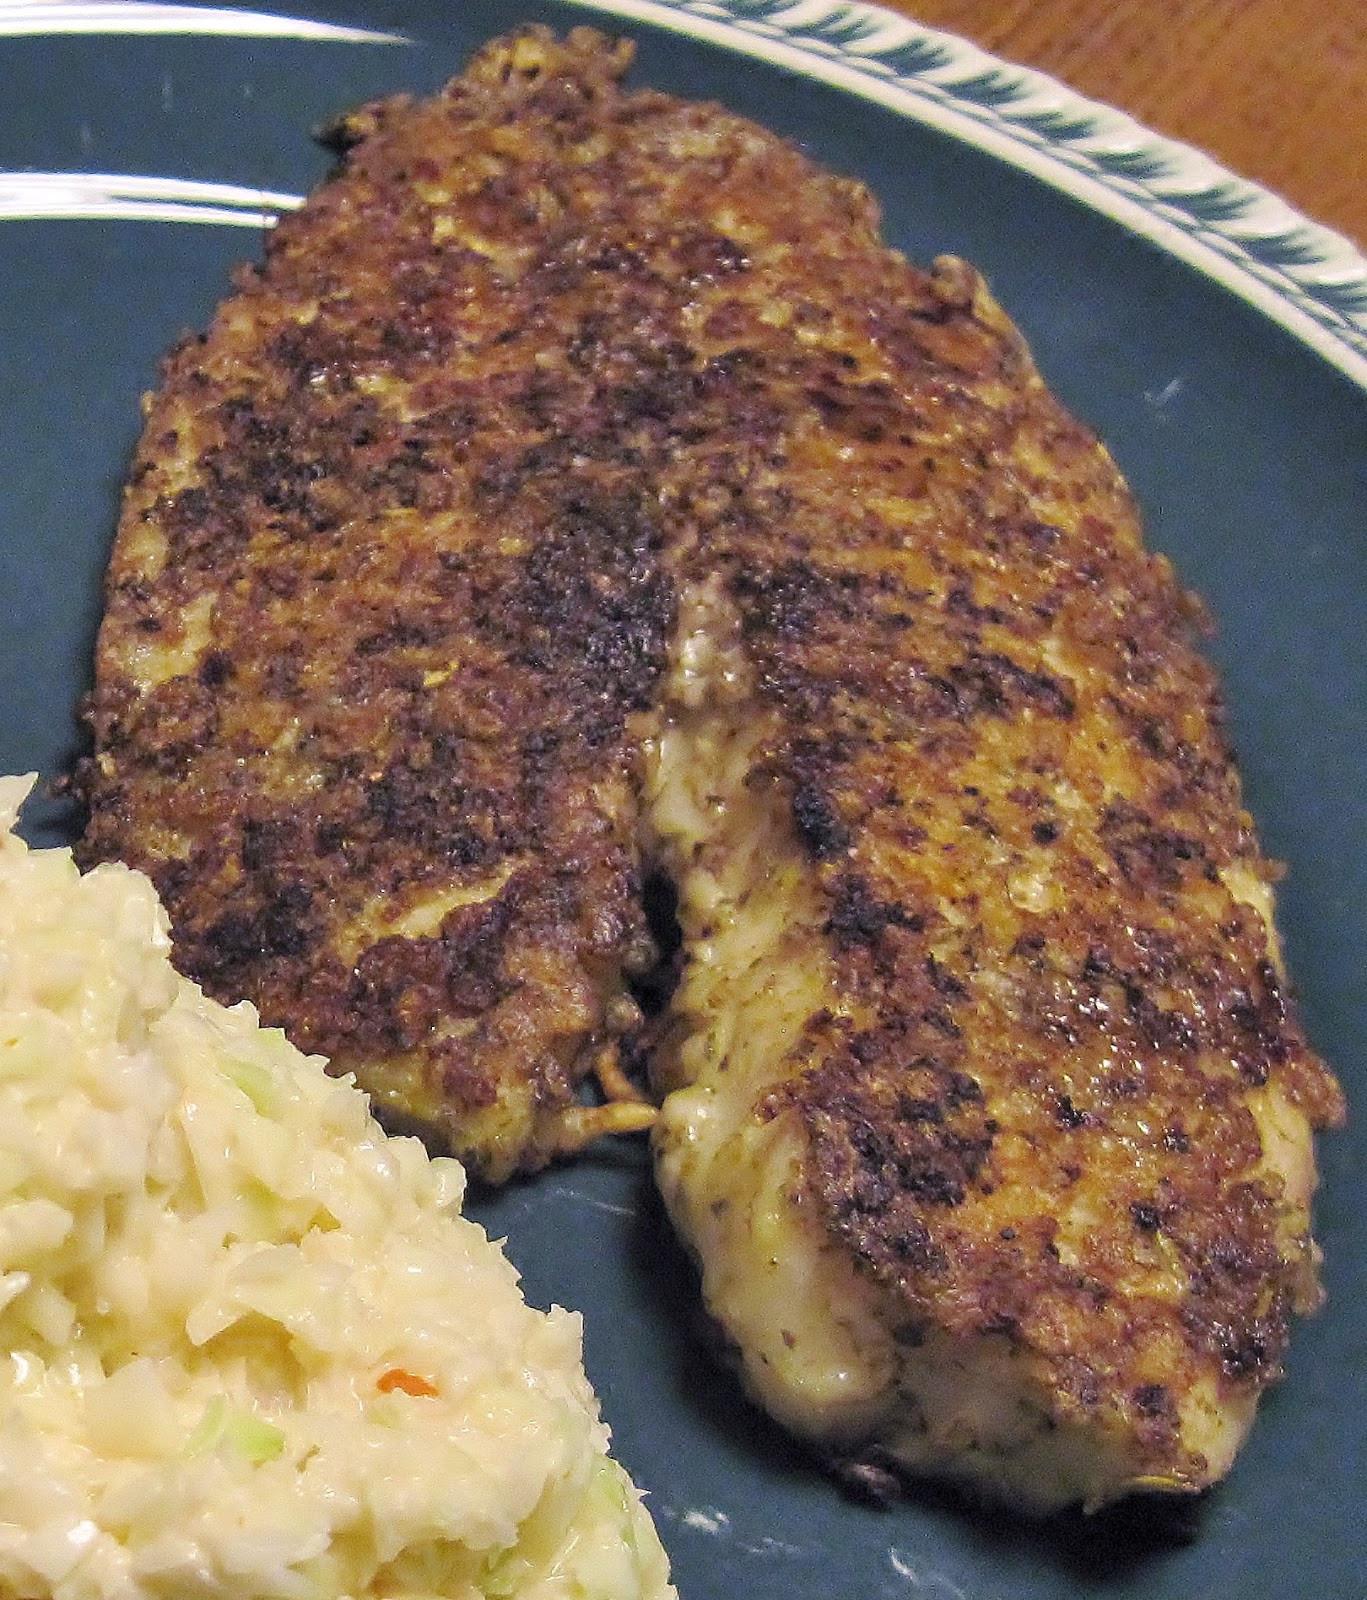 Low Carb Breaded Fish  Carolina Sauce pany Low Carb Recipe Parmesan Crusted Fish